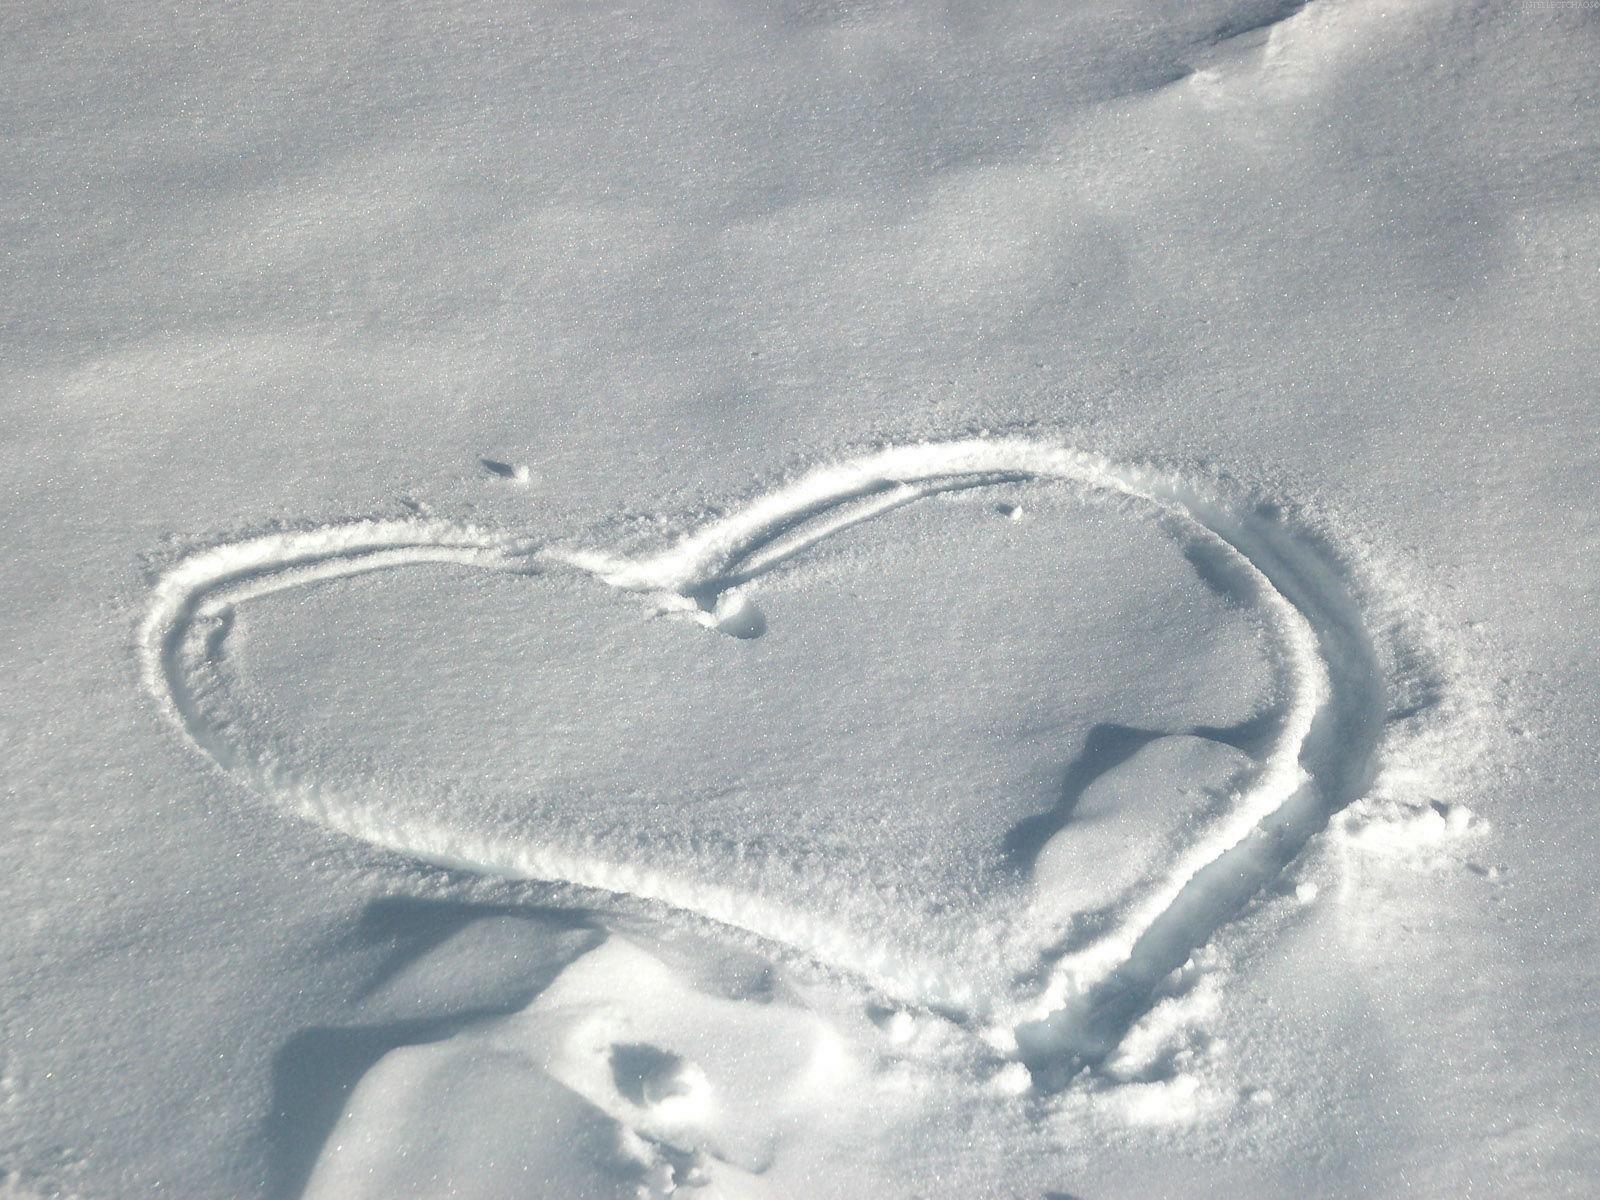 Hd 1600x1200 Heart On Snow Desktop Wallpapers Backgrounds 1600x1200